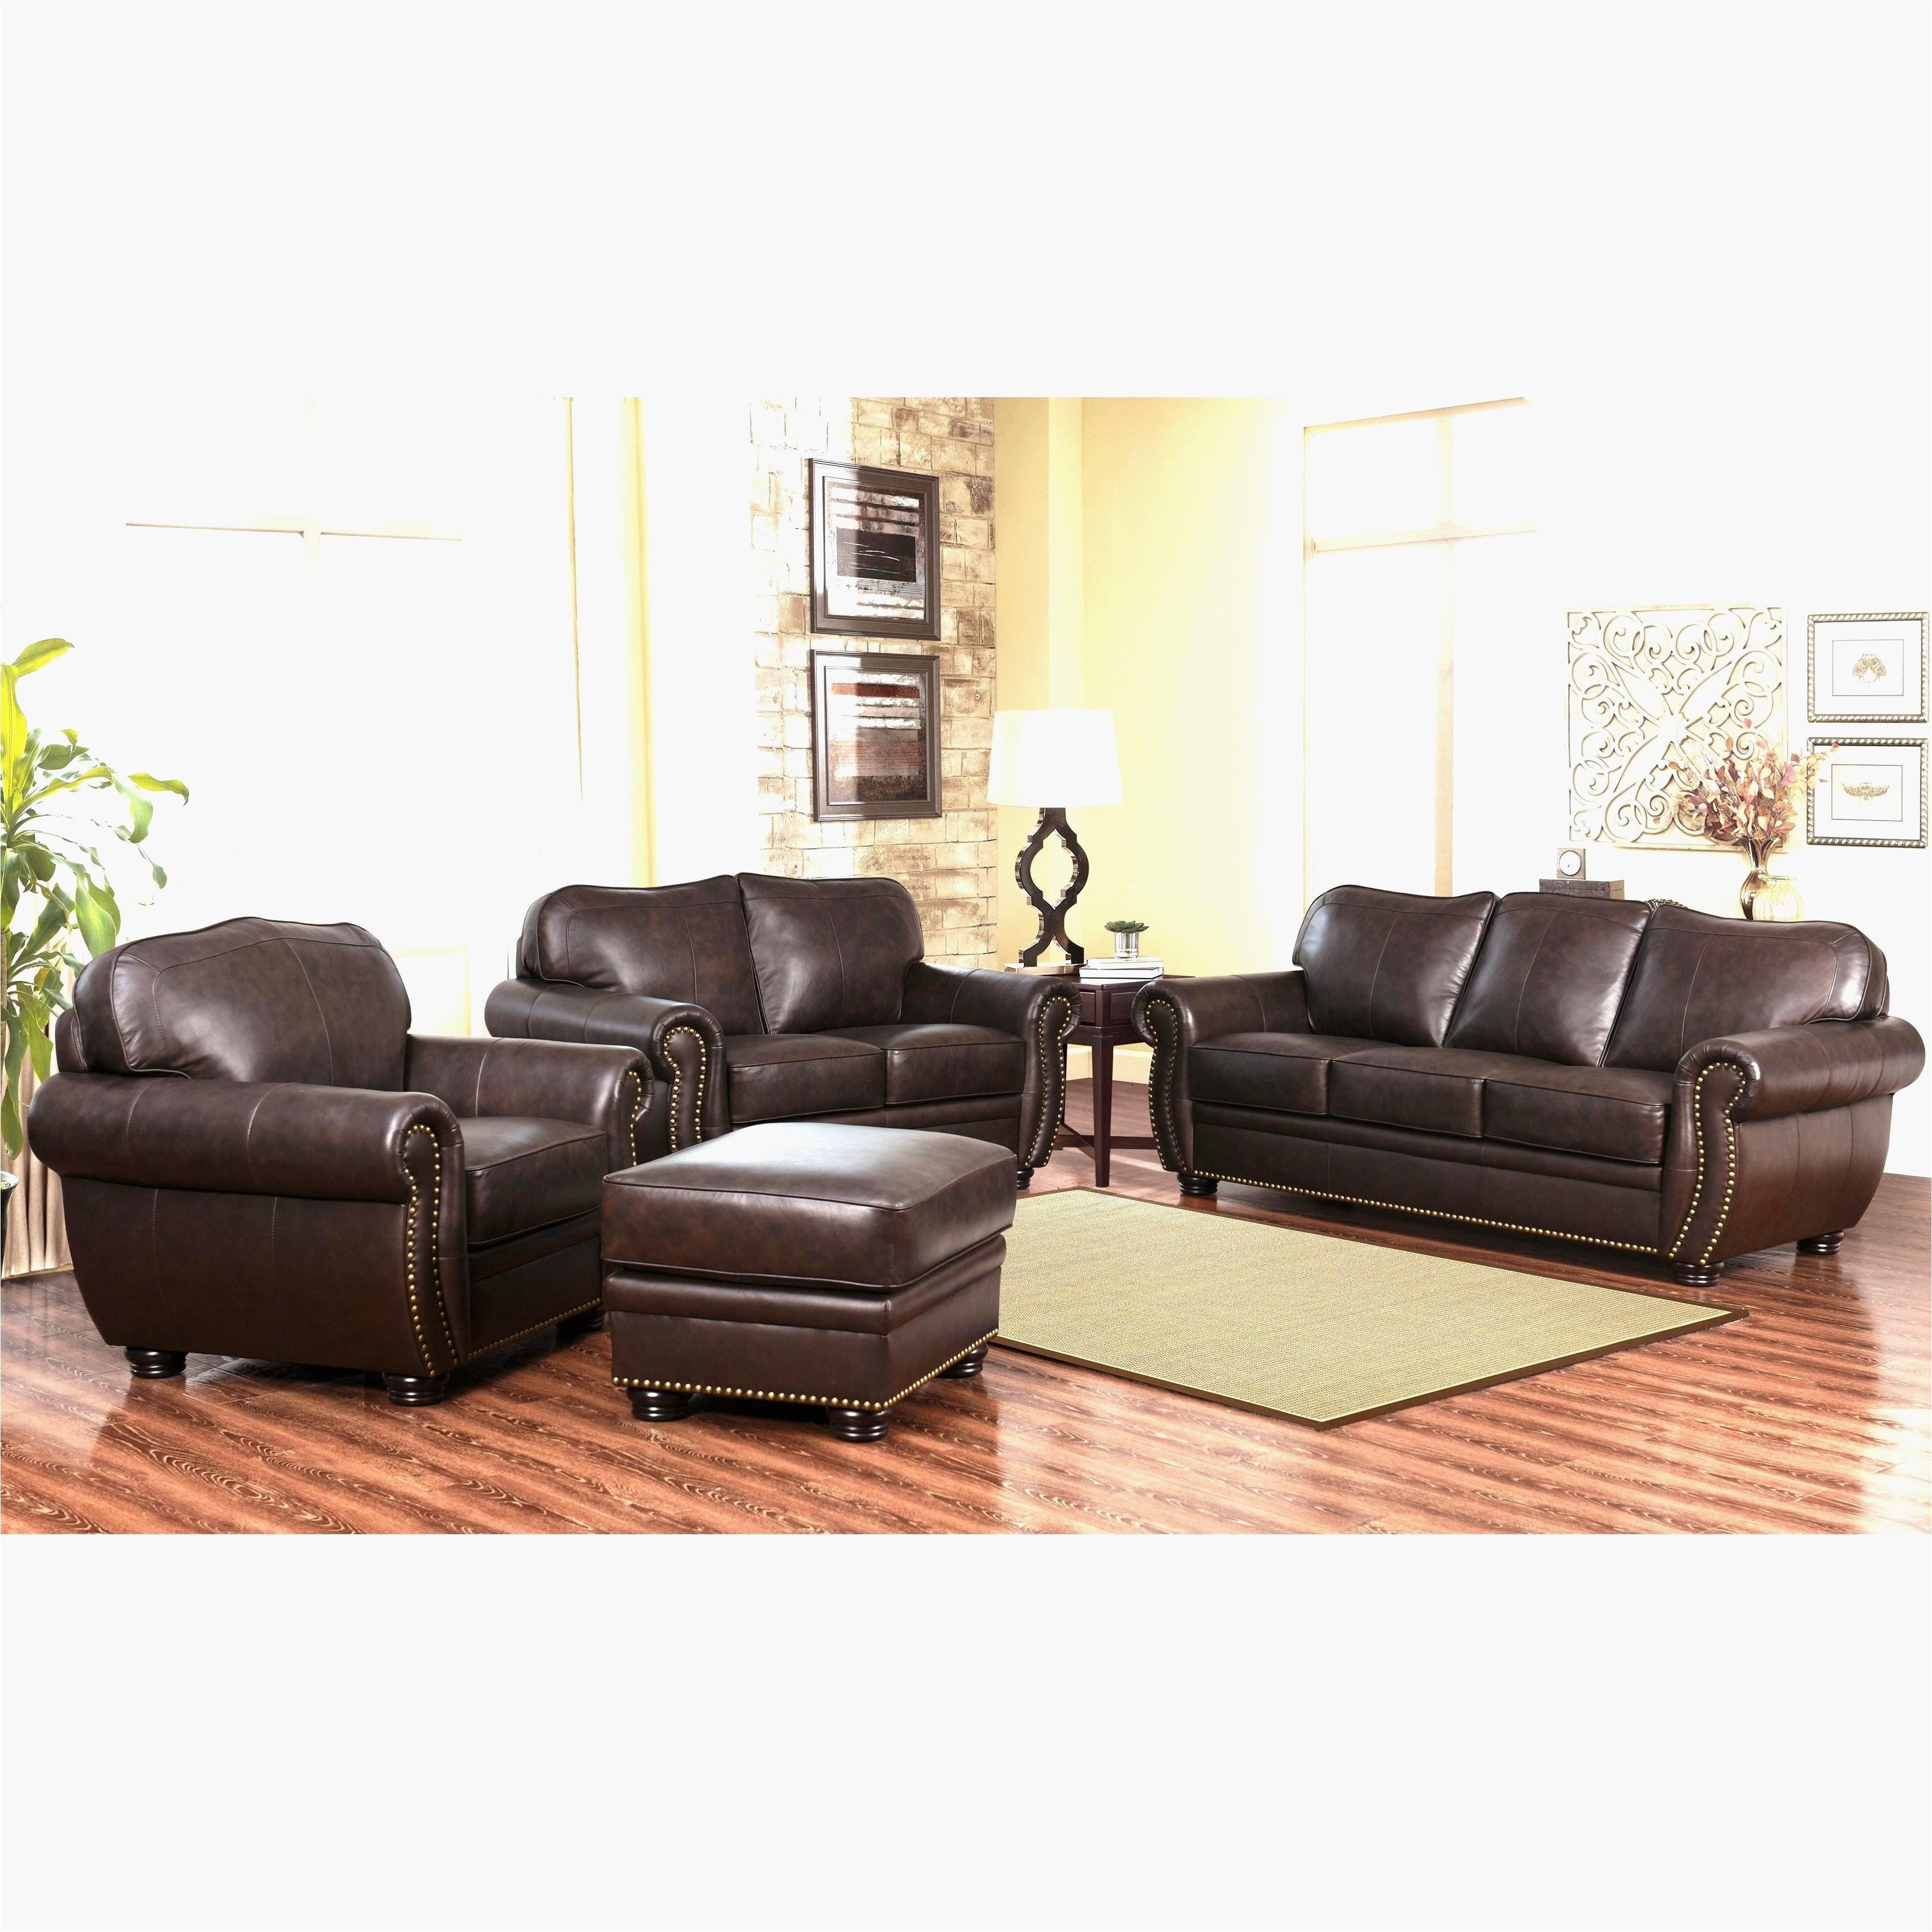 harlem furniture living room sets inspirational especial bath sofa tray cupboard carpet lear living room sets